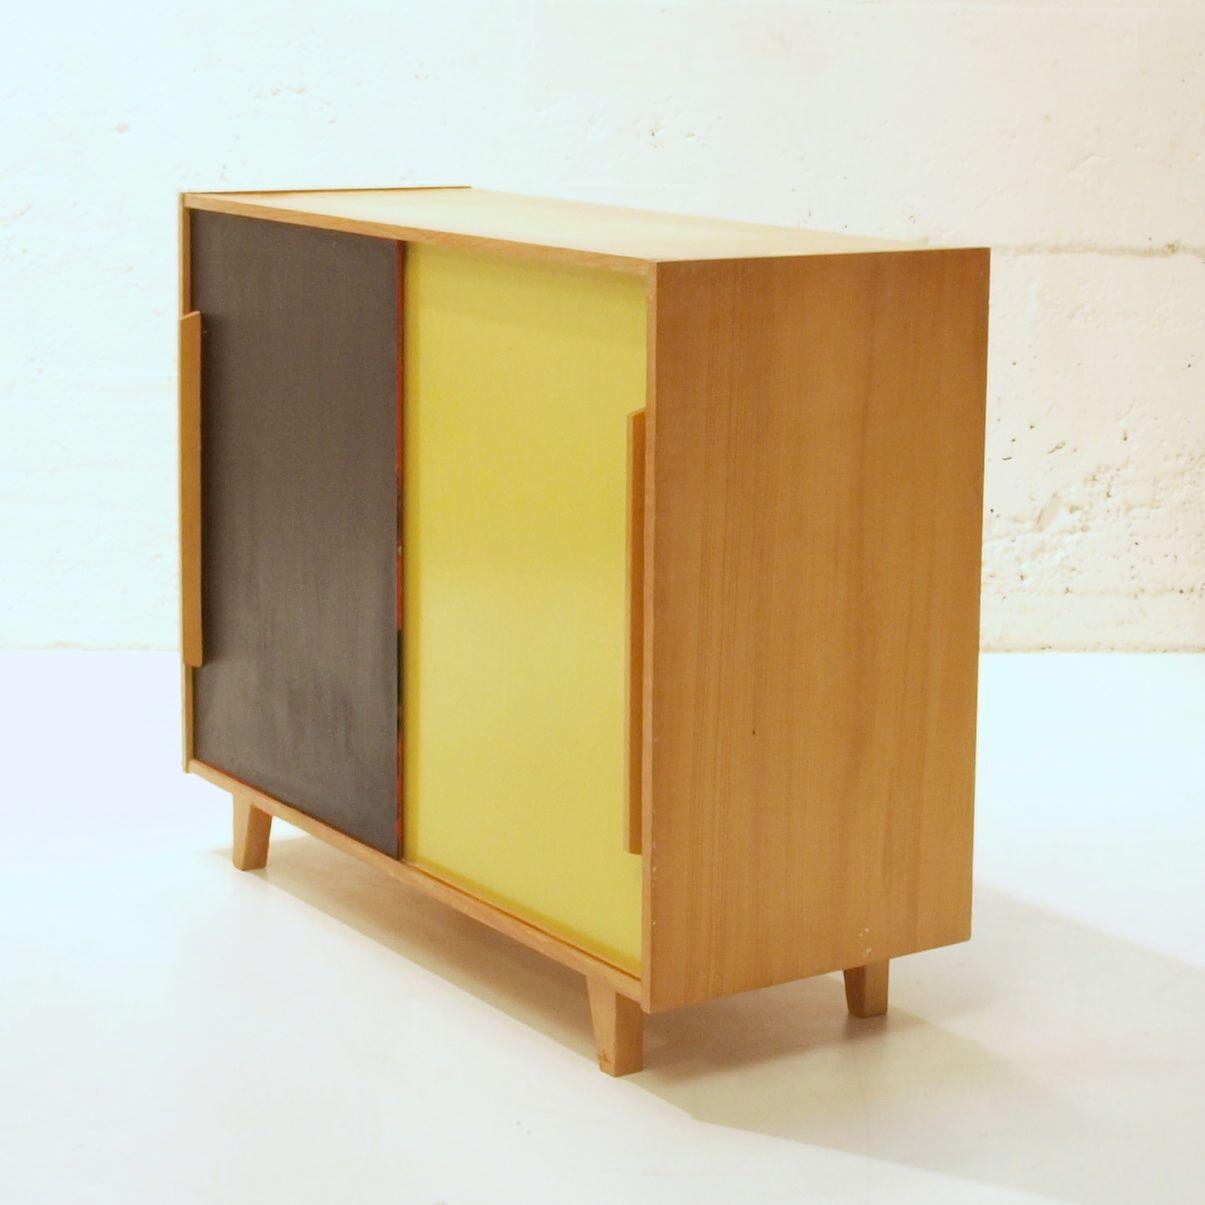 schiebeschrank gelb schwarz m bel z rich vintagem bel. Black Bedroom Furniture Sets. Home Design Ideas